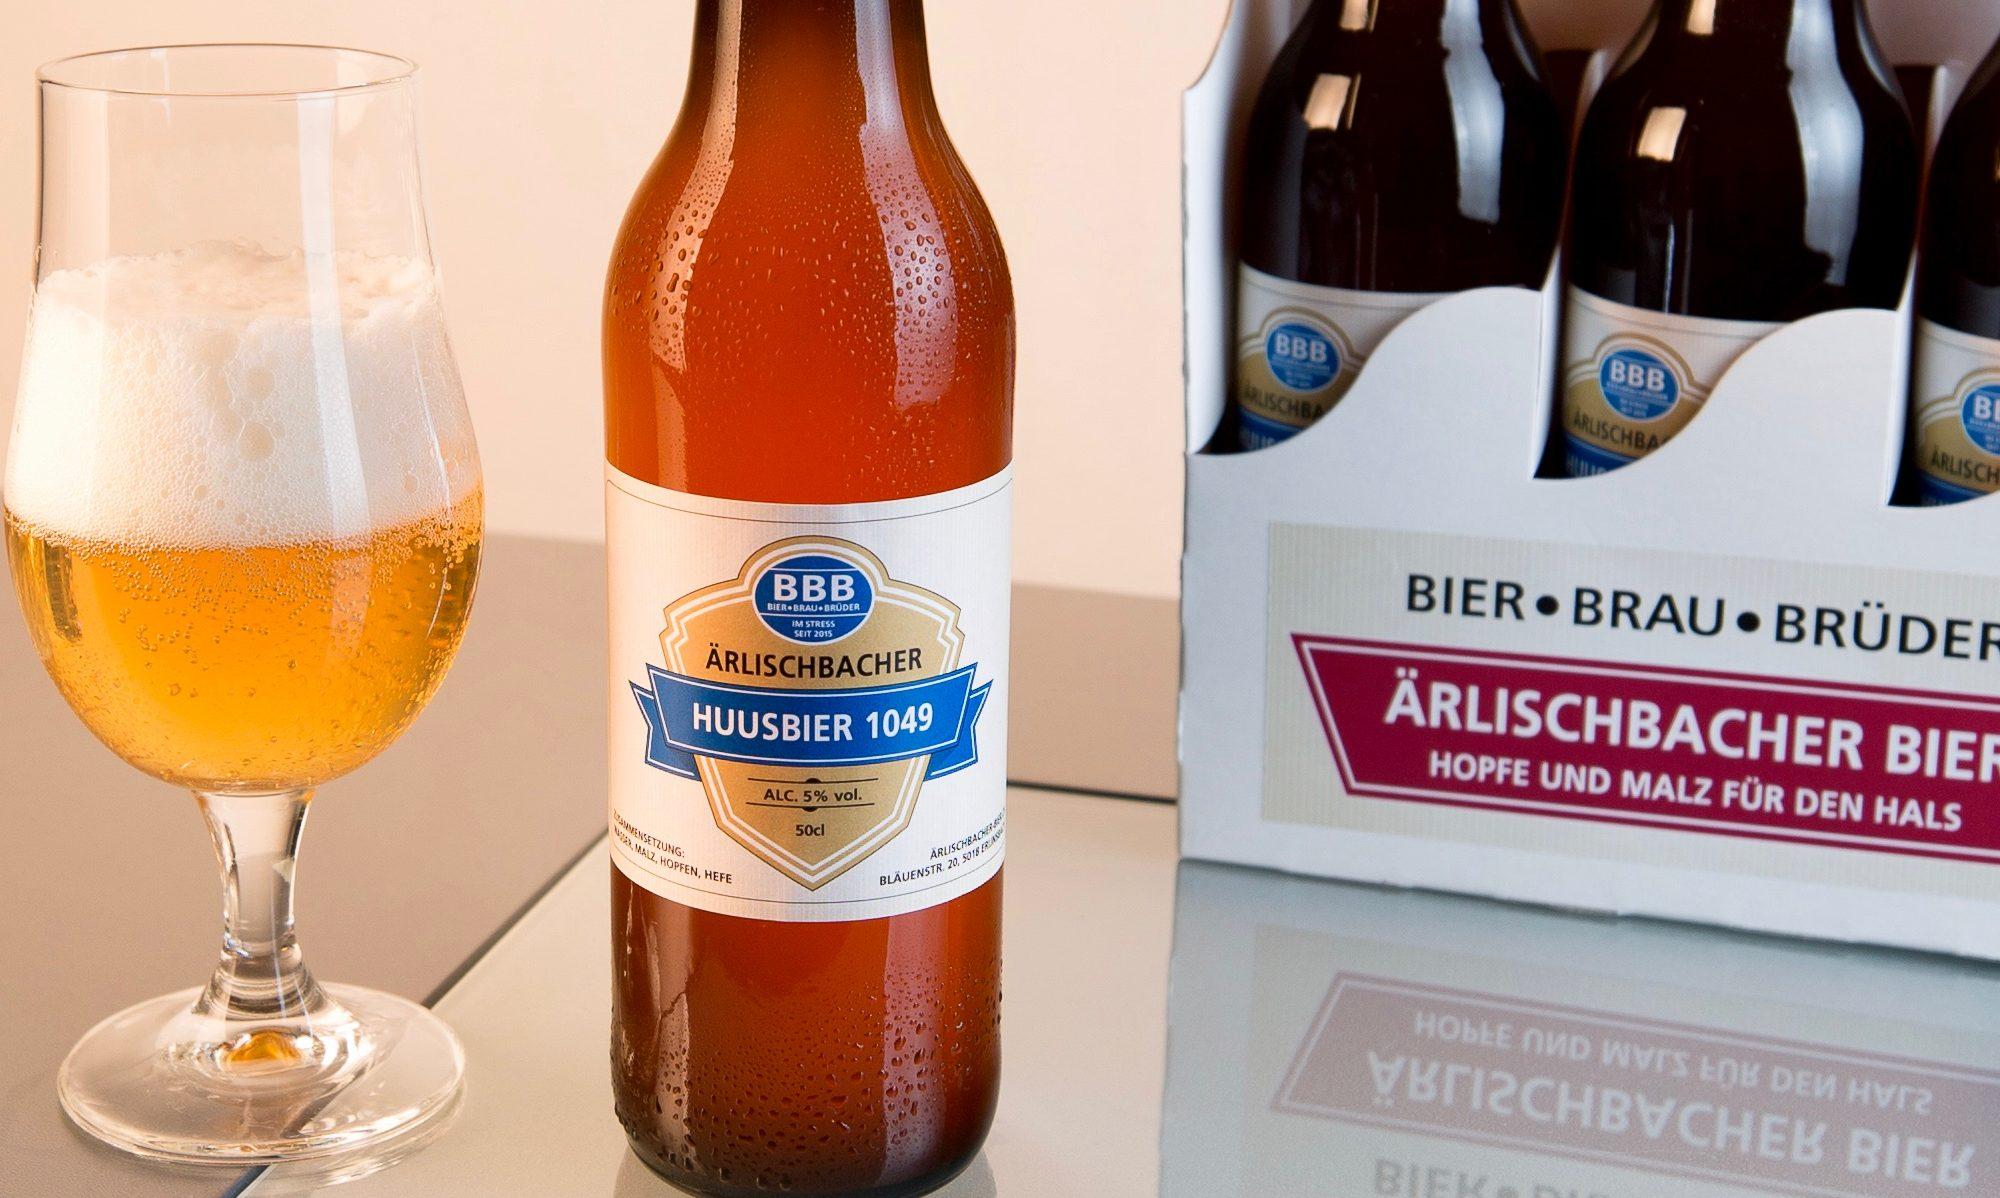 Ärlischbacher Bier | Erlinsbacher Bier